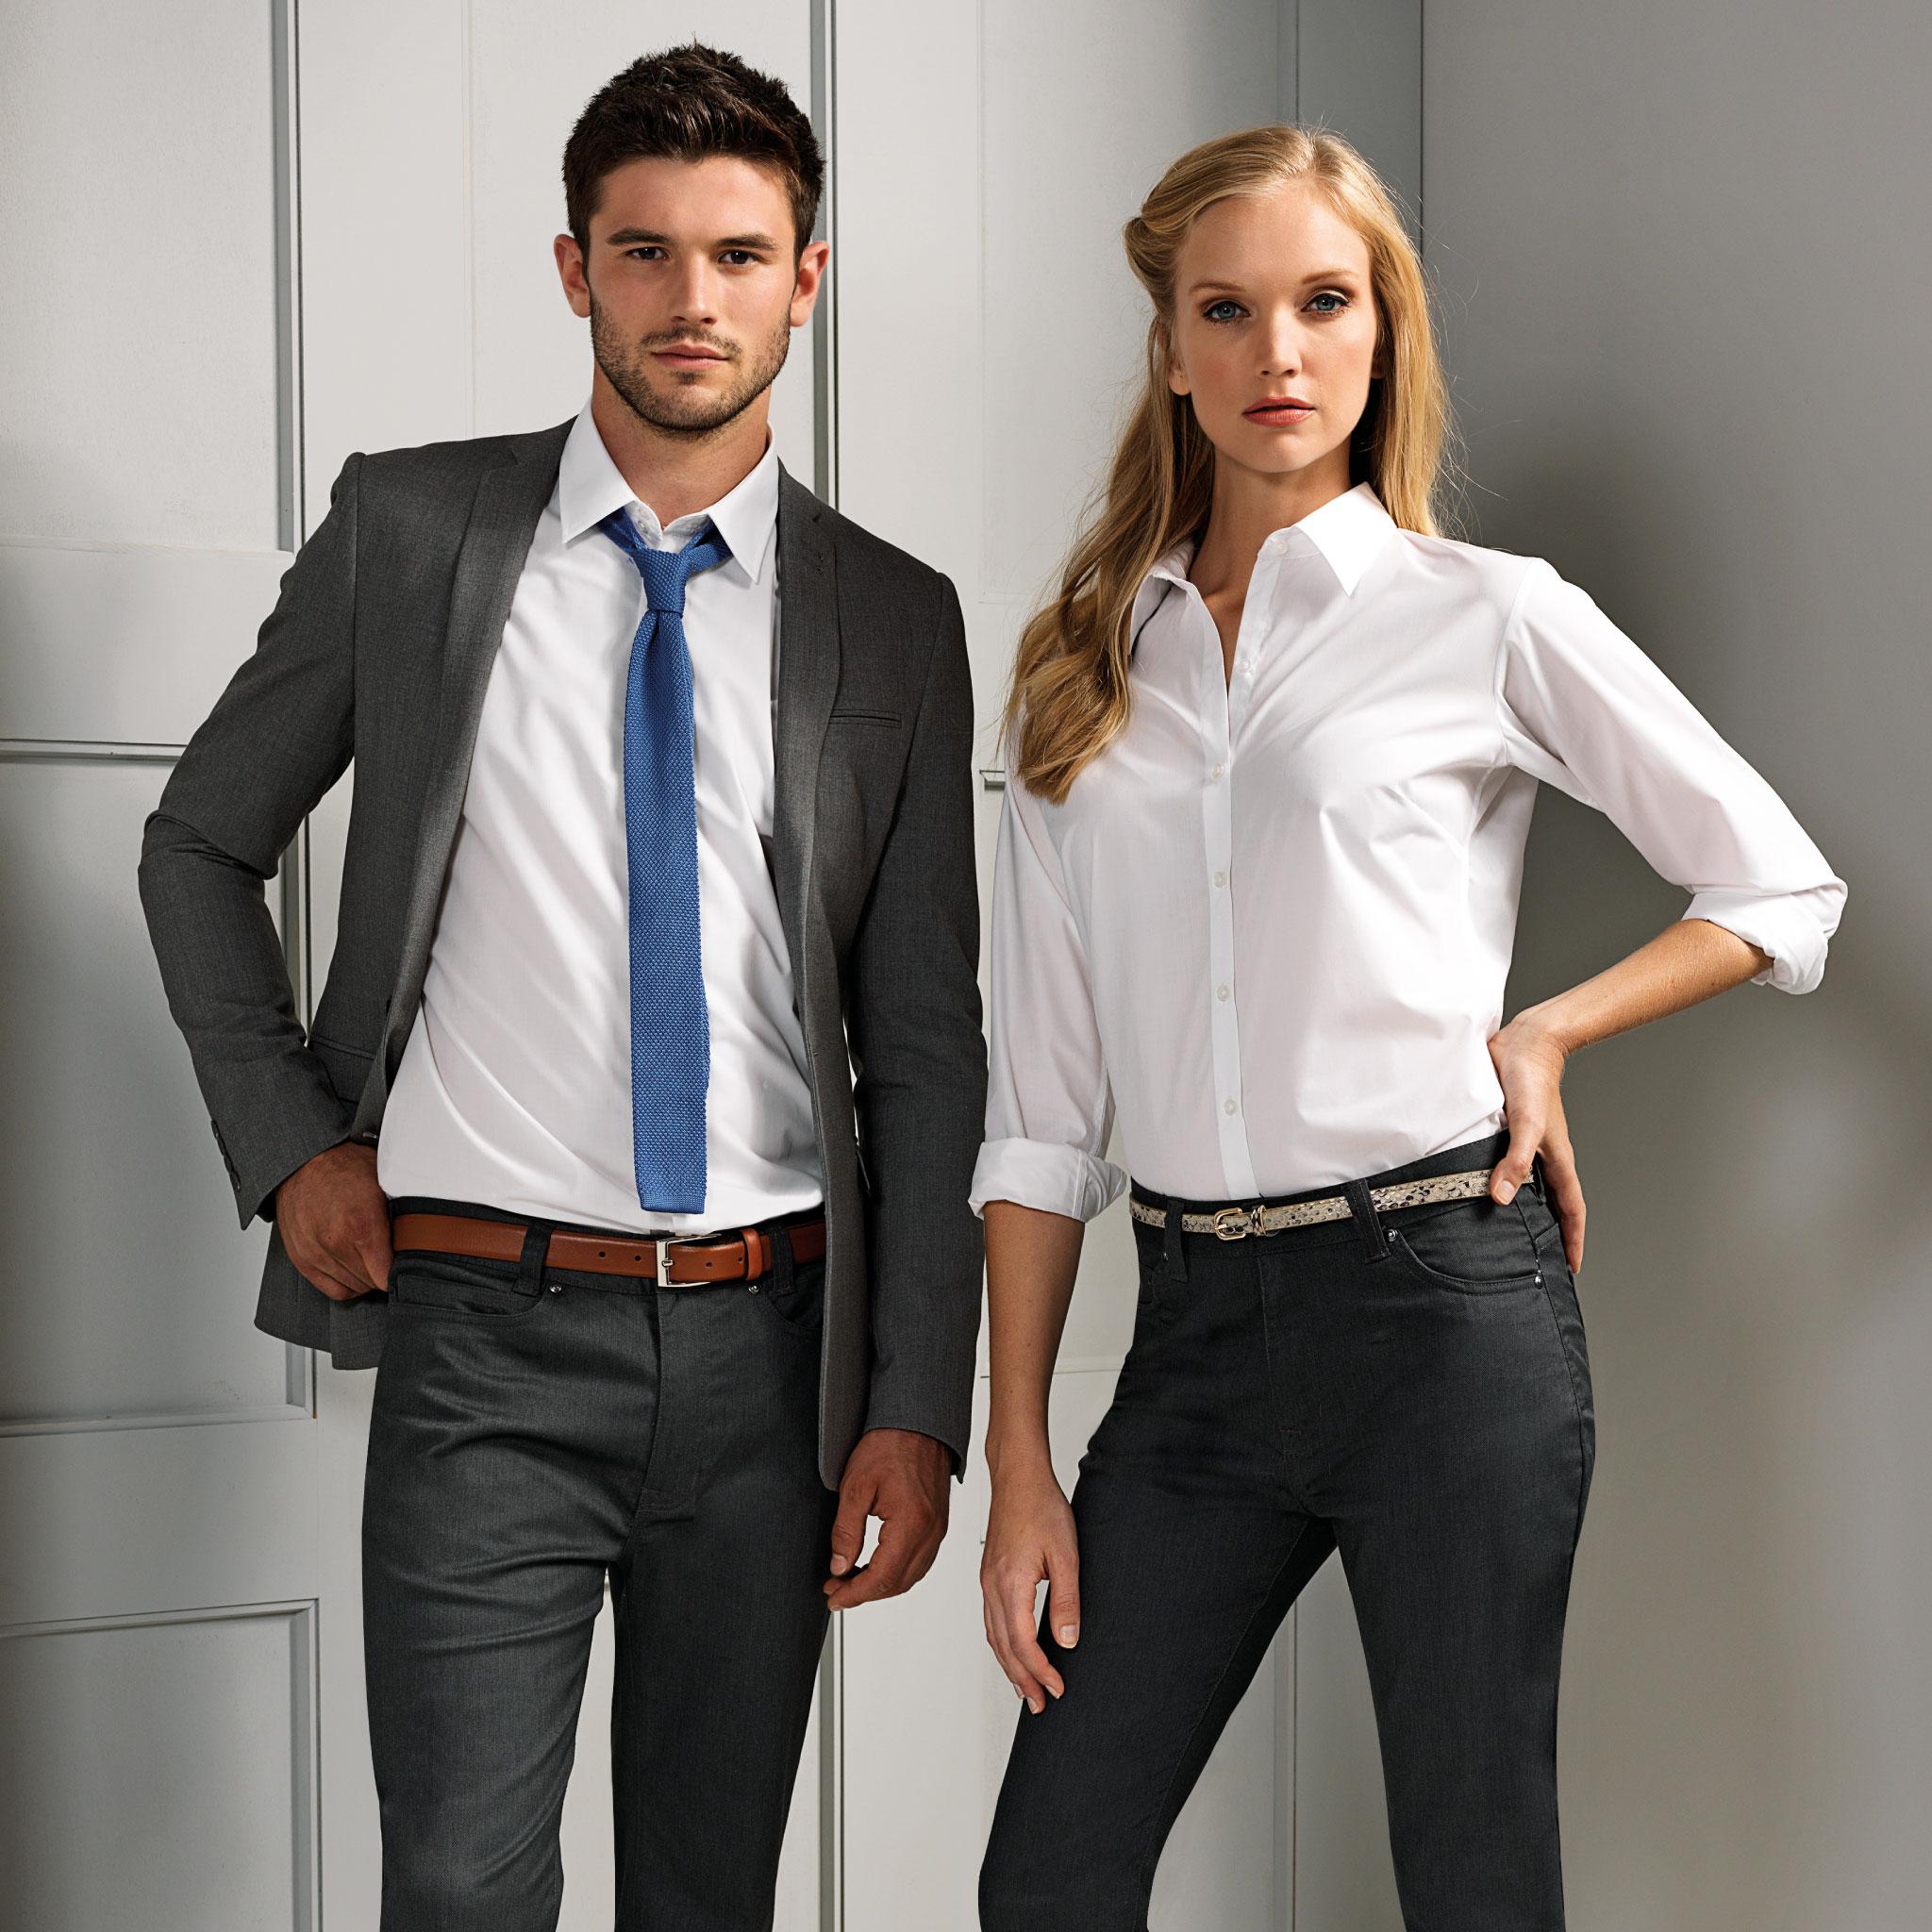 Business & Corporate Workwear